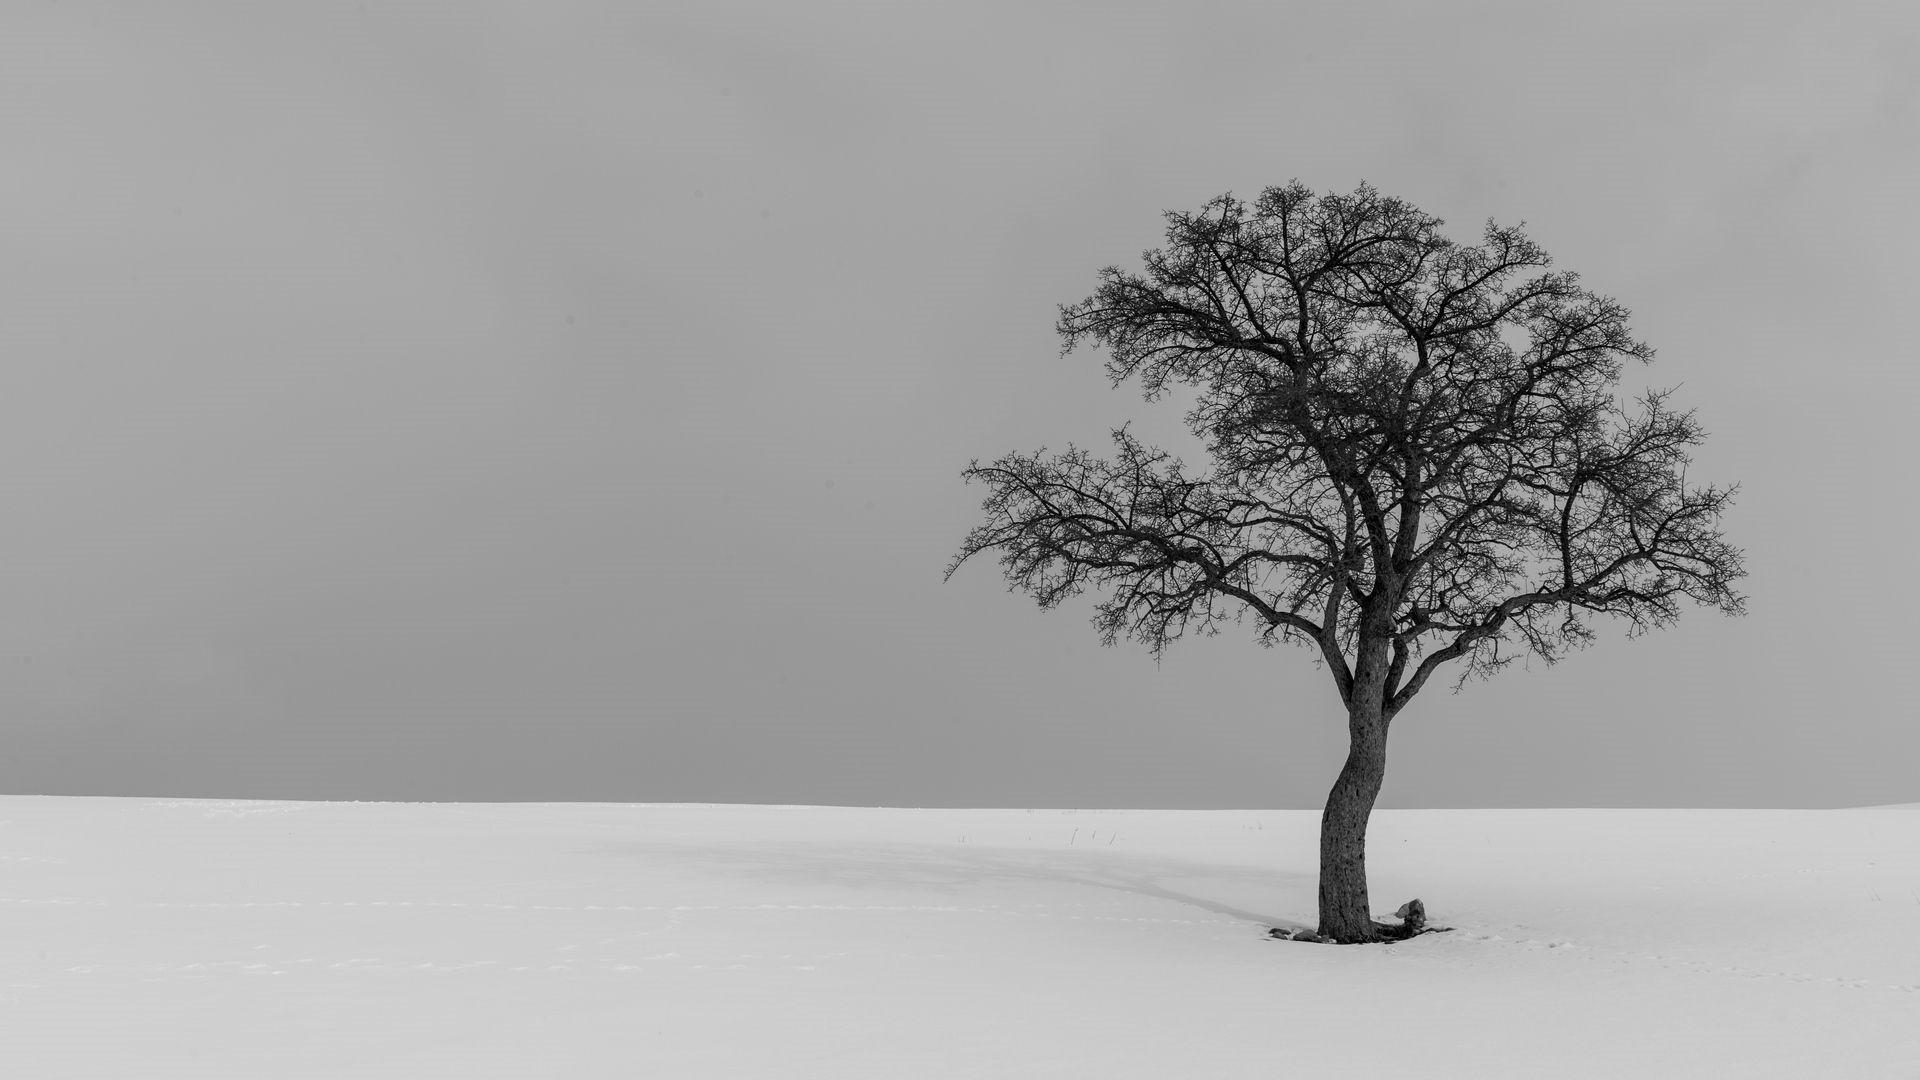 Lonely Trees Minimalist Wallpaper